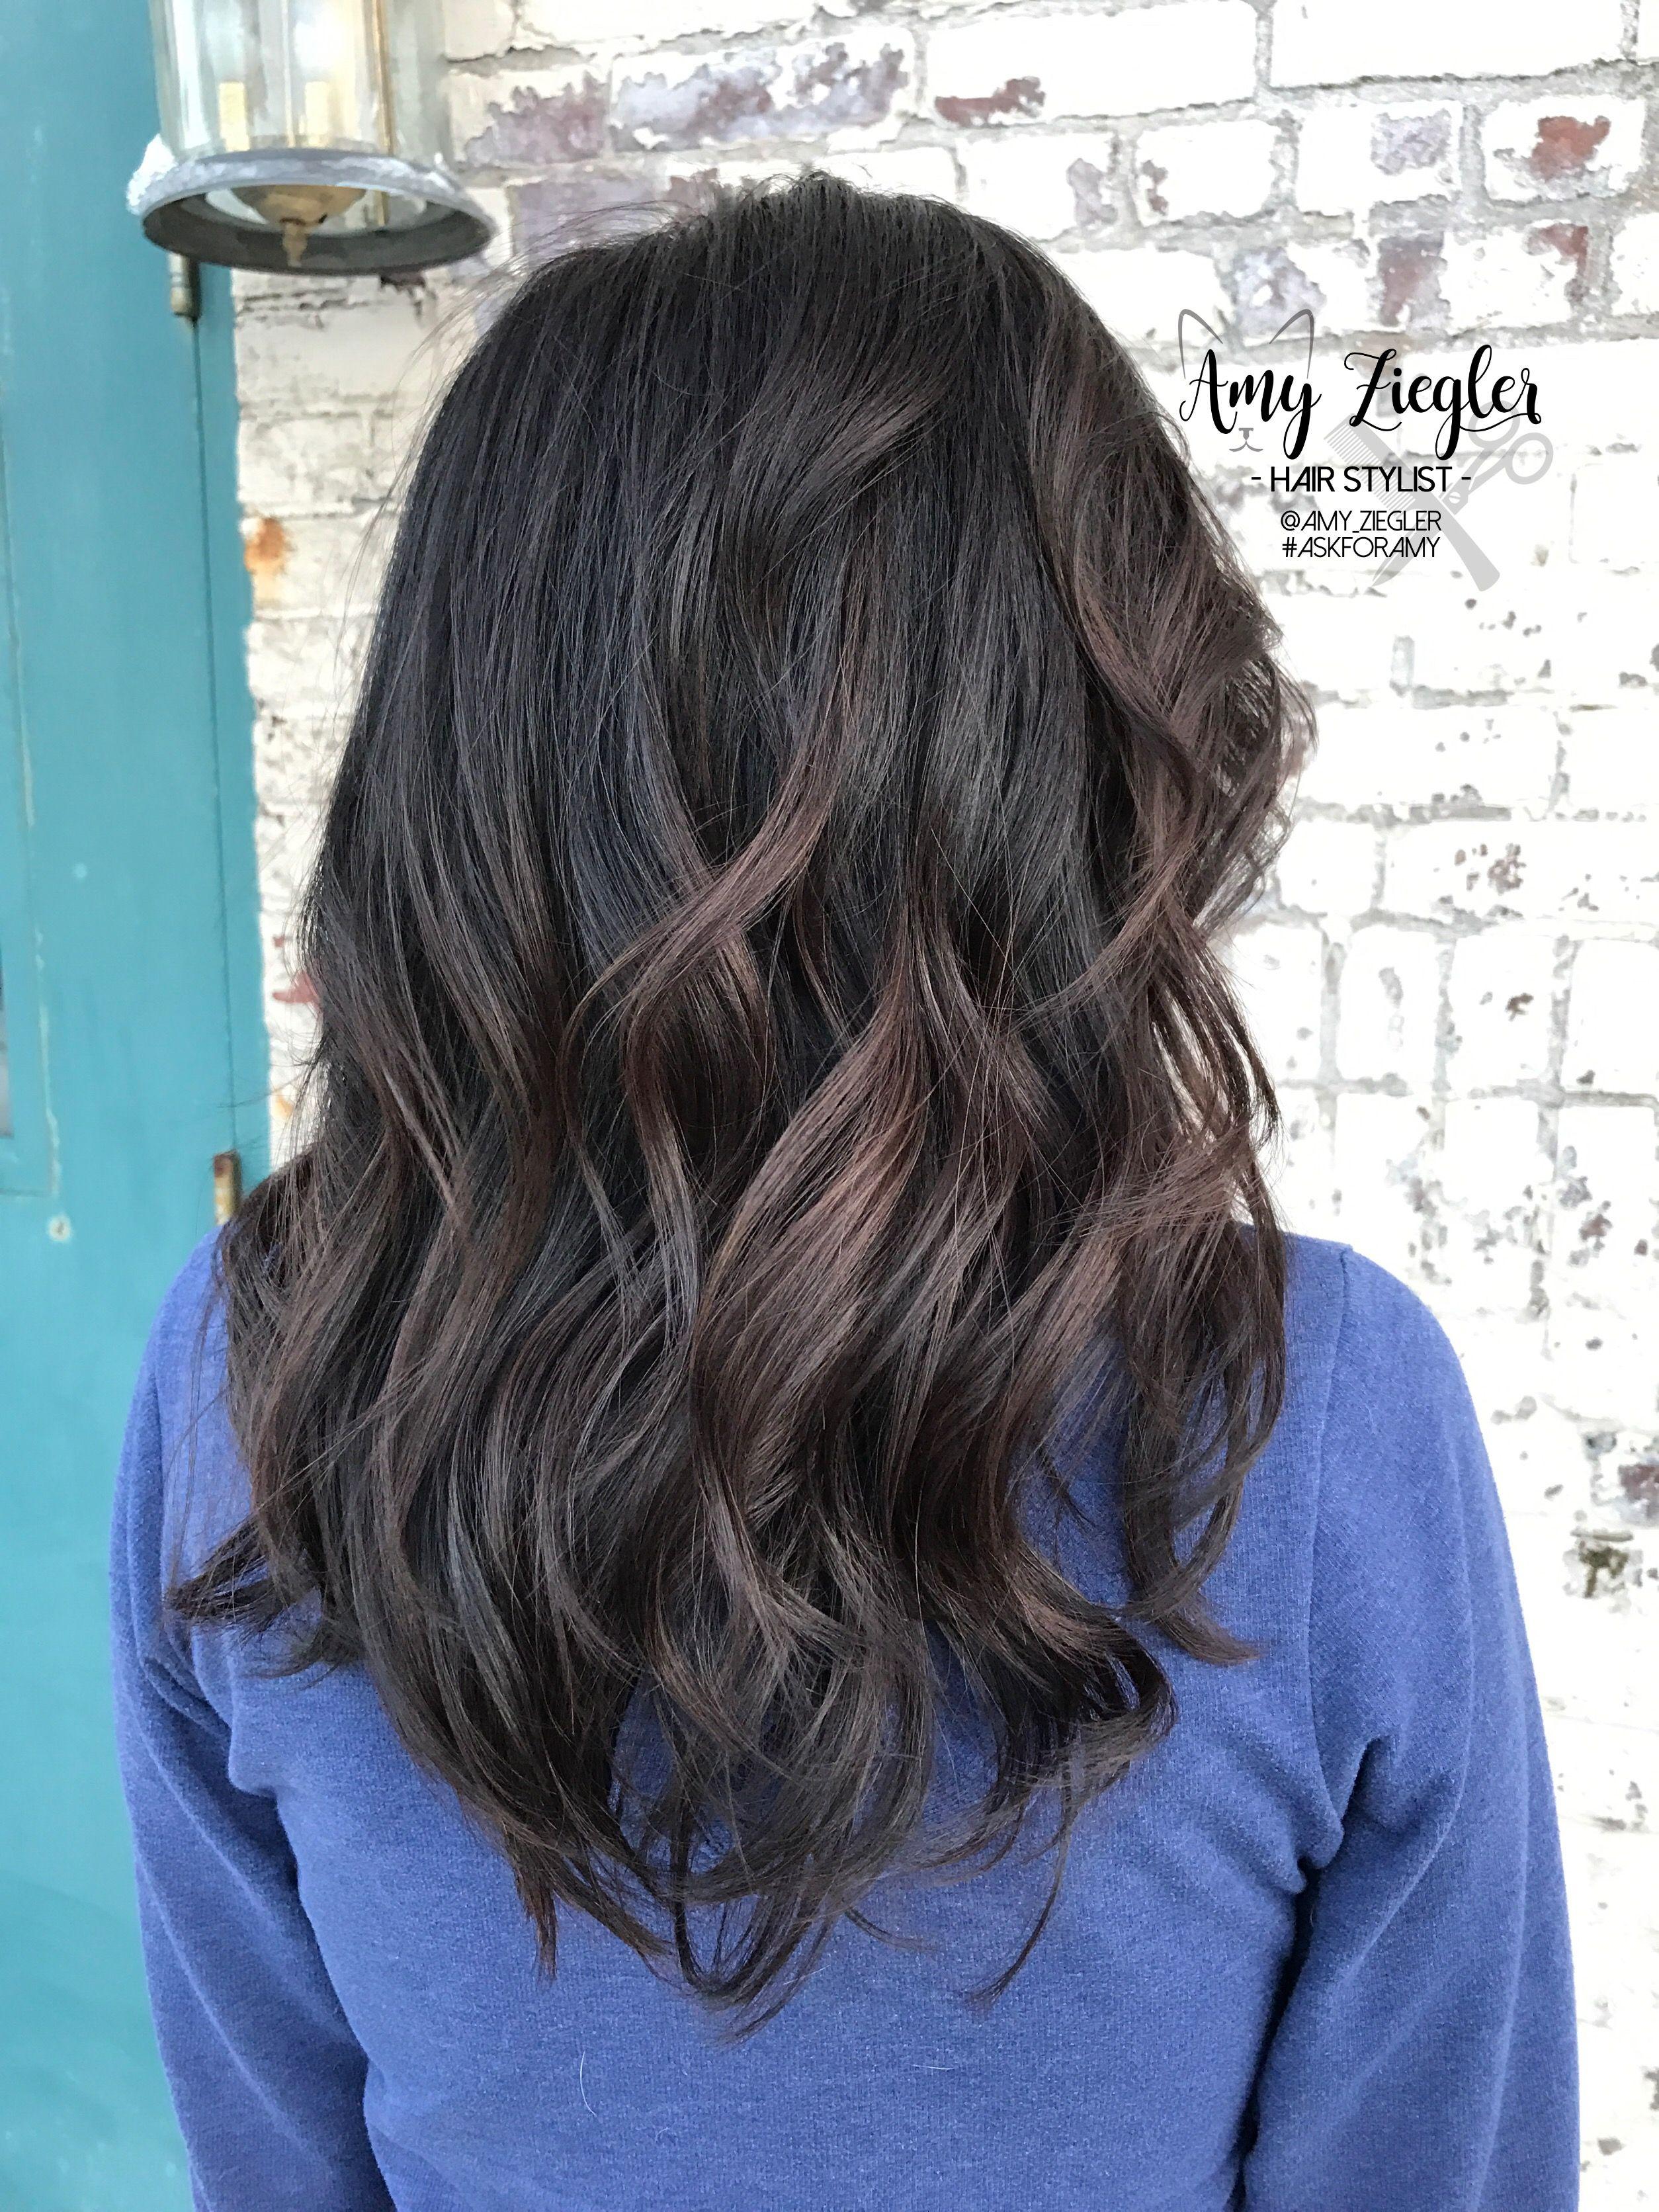 Dark chocolate brown haircolor multi-tonal by @amy_ziegler ...